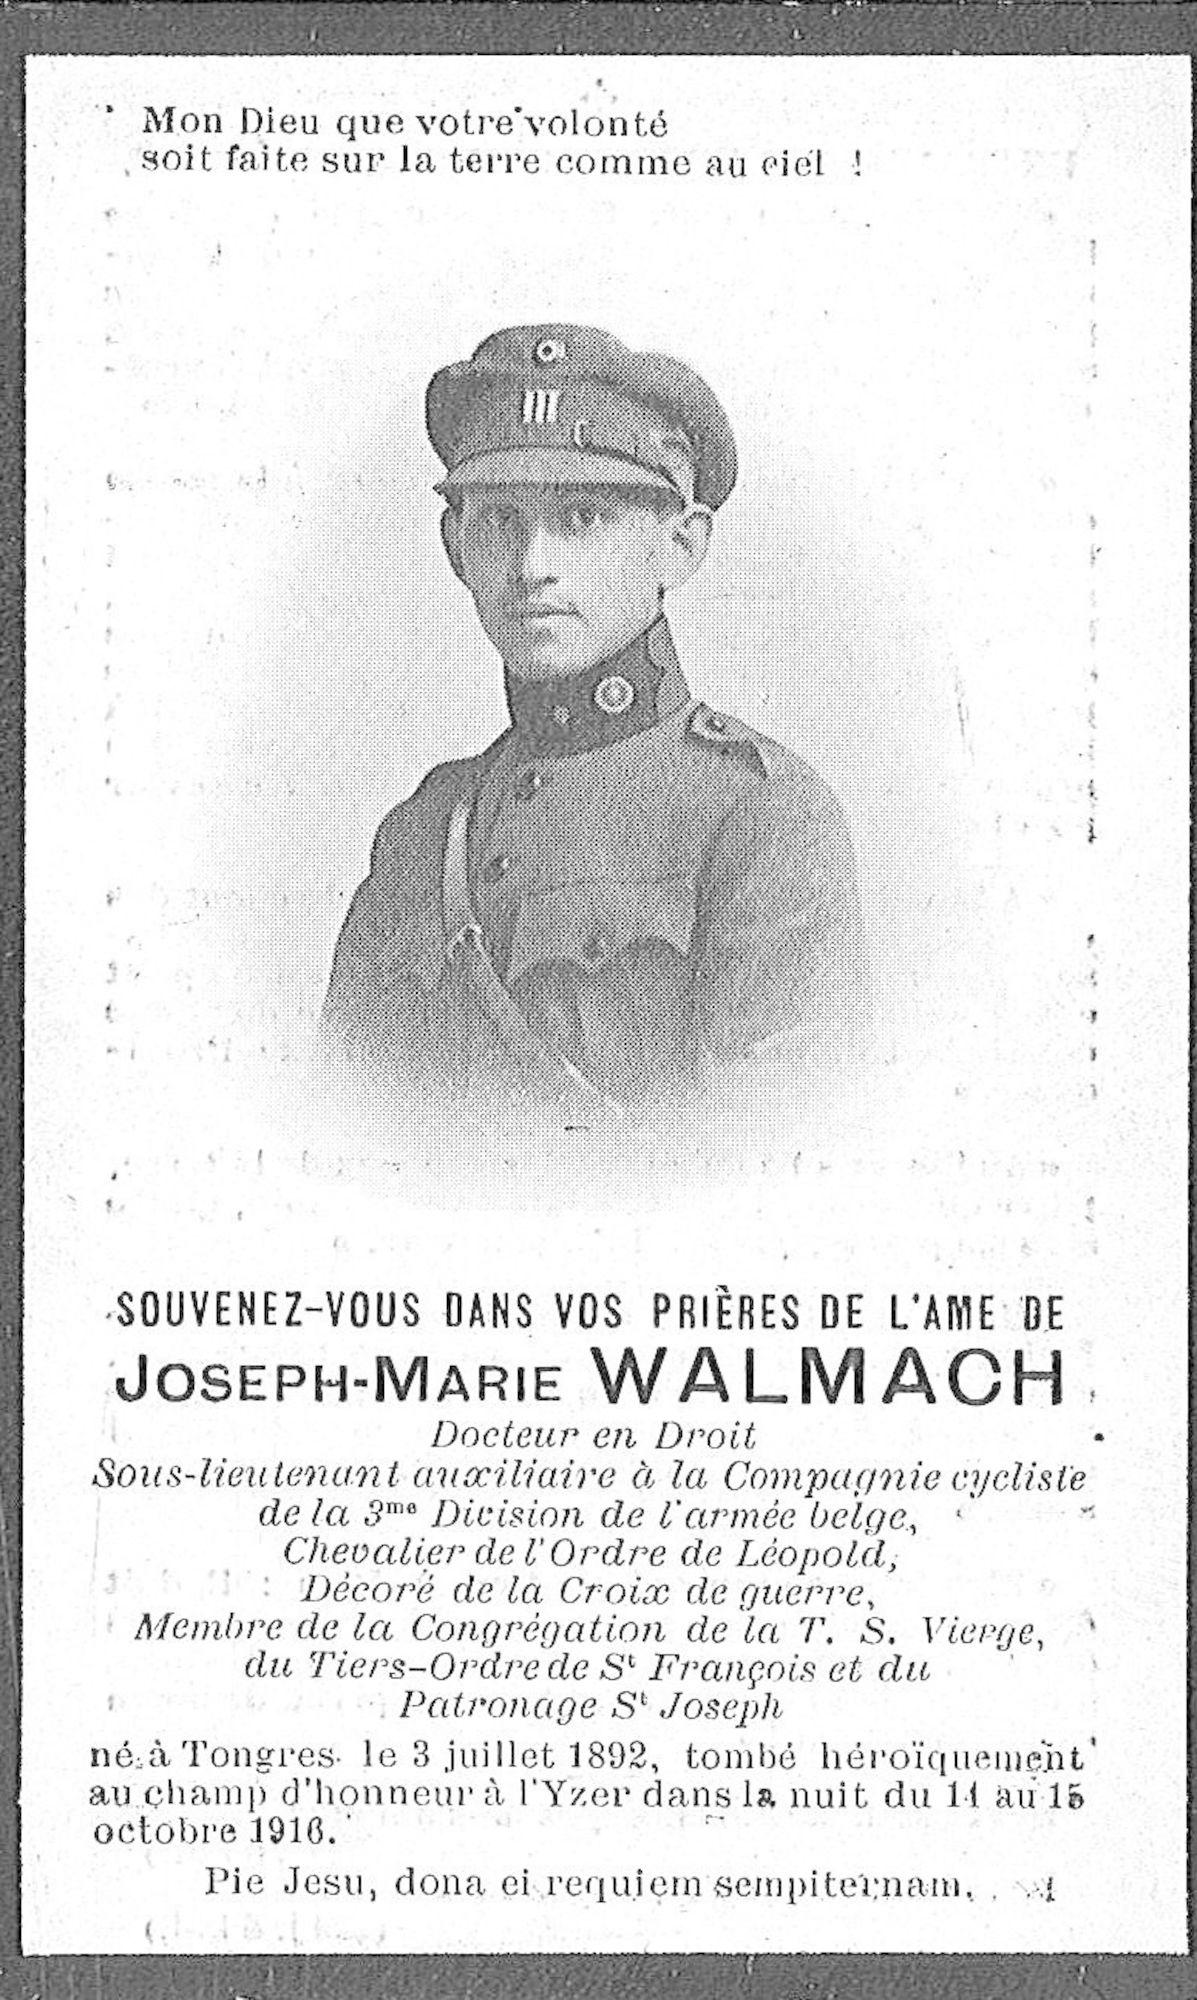 Joseph-Marie Walmach